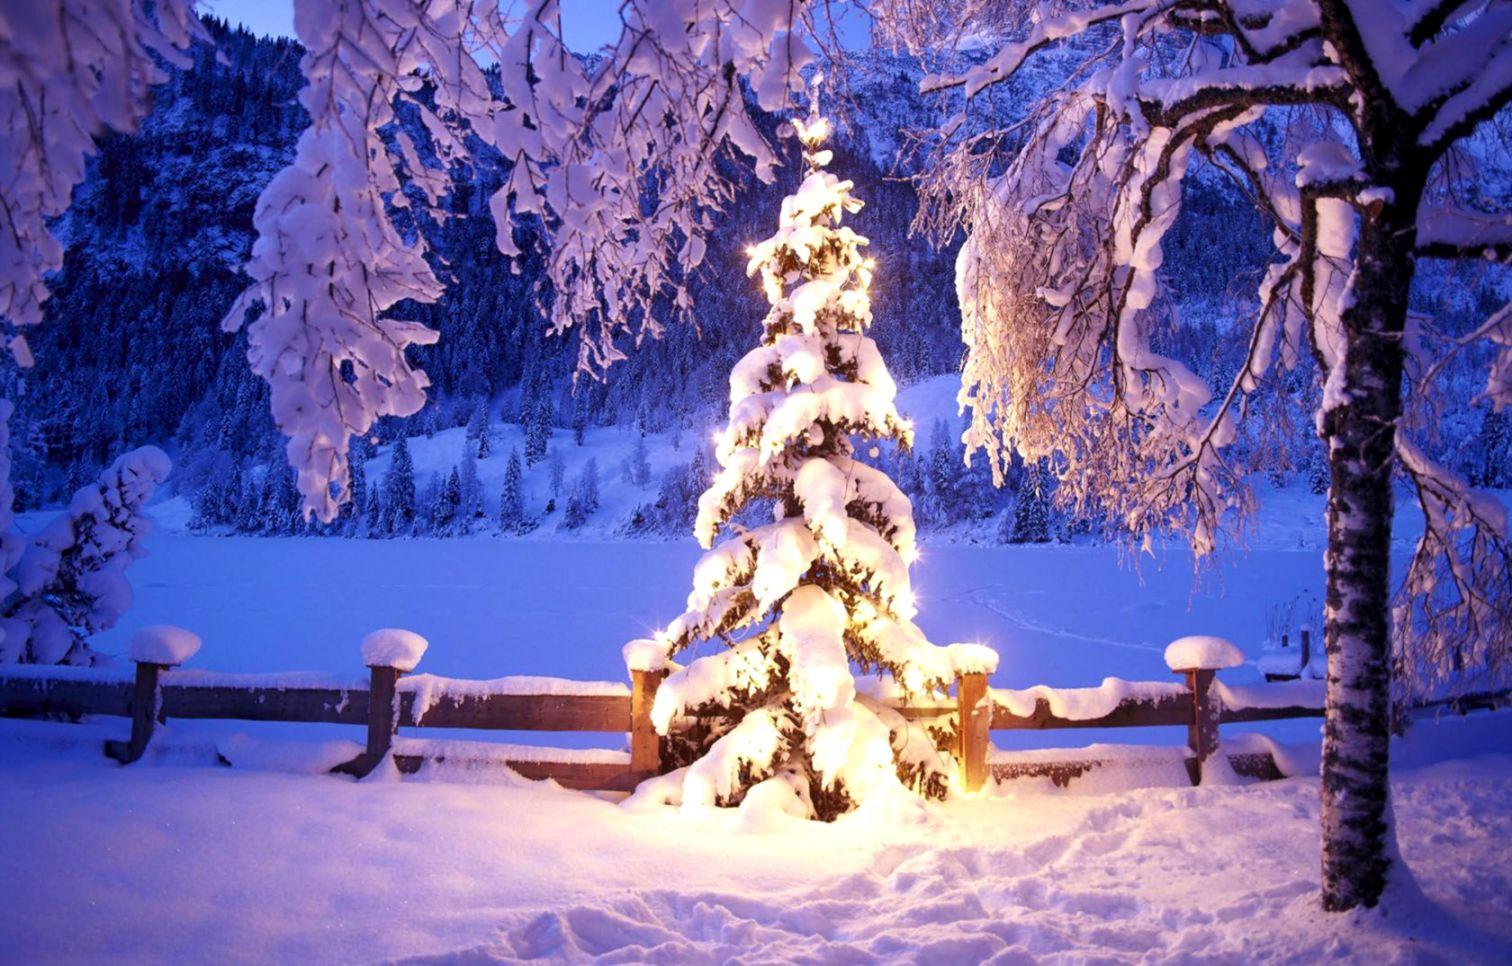 Beautiful Christmas Winter Scenes Wallpaper | Wallpapers Design